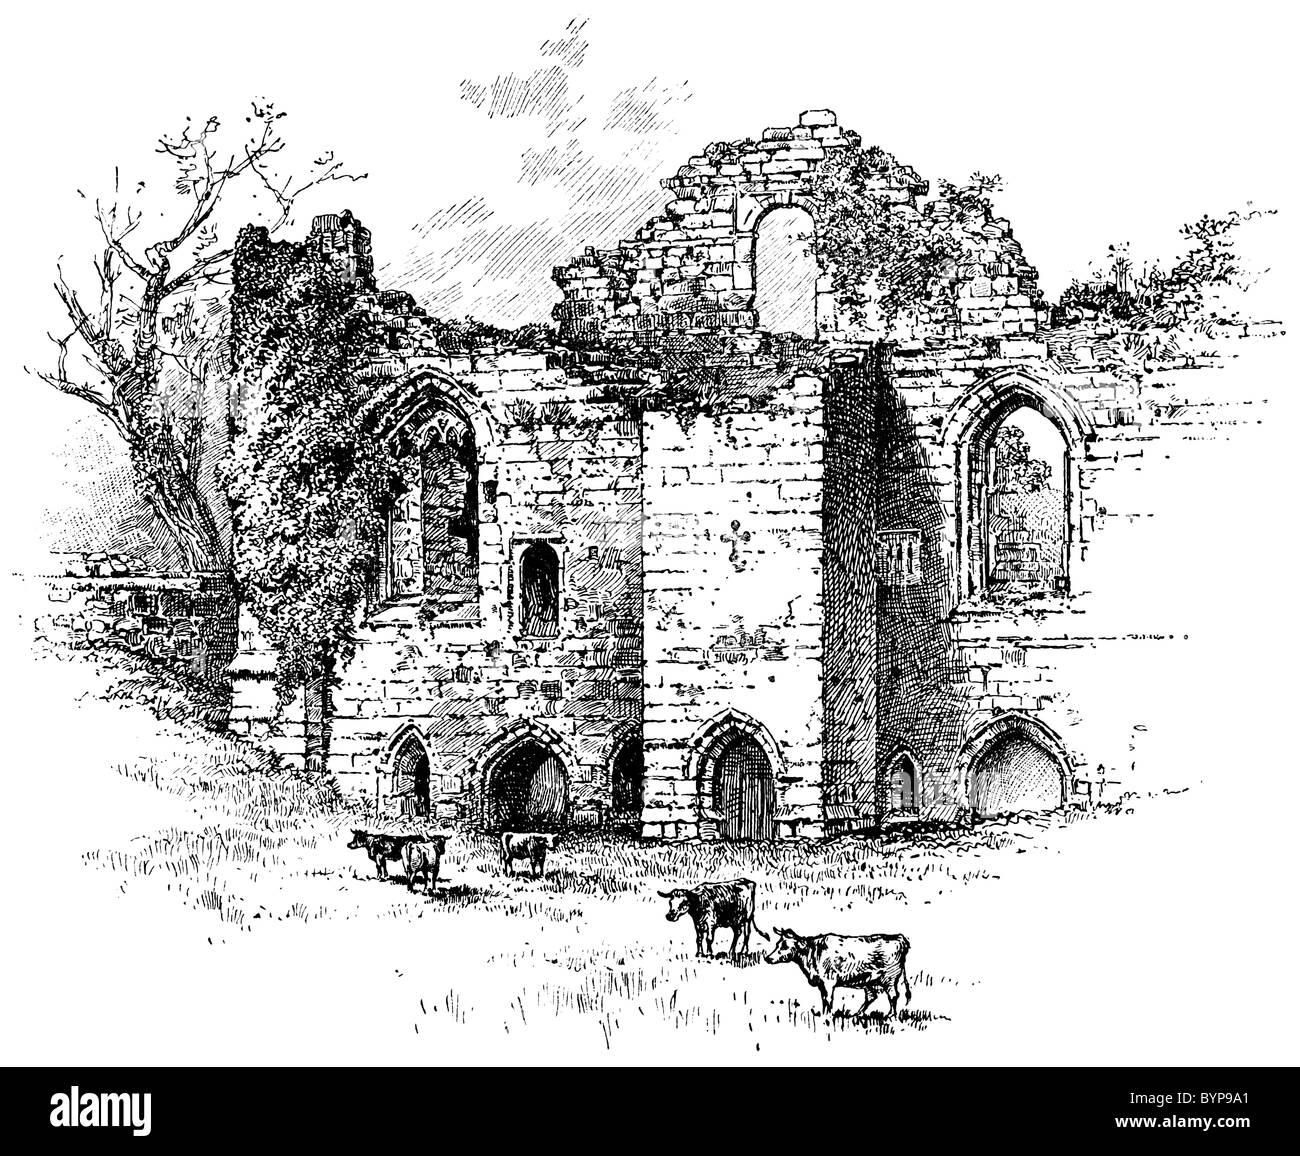 Victorian engraving of Tutbury Castle, Staffordshire - Stock Image